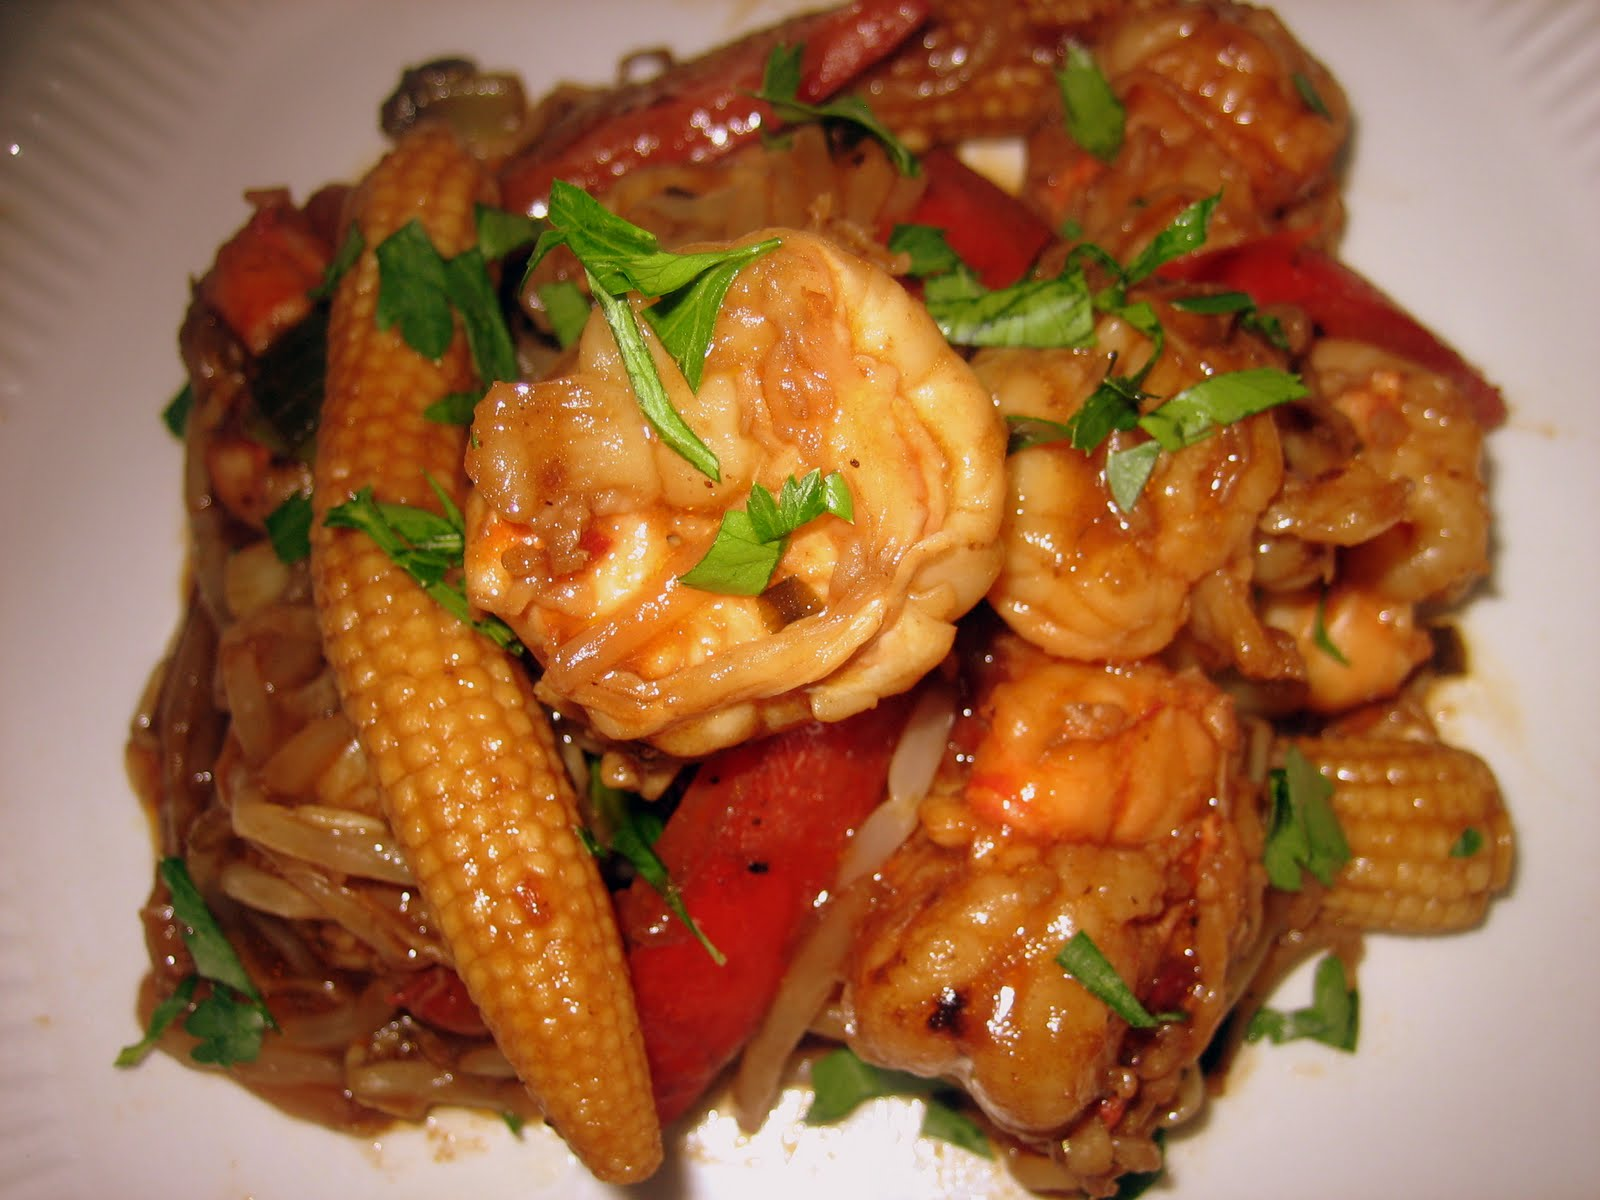 Stir-Fry Spicy Shrimp with Vegetables in Black Bean Garlic Sauce